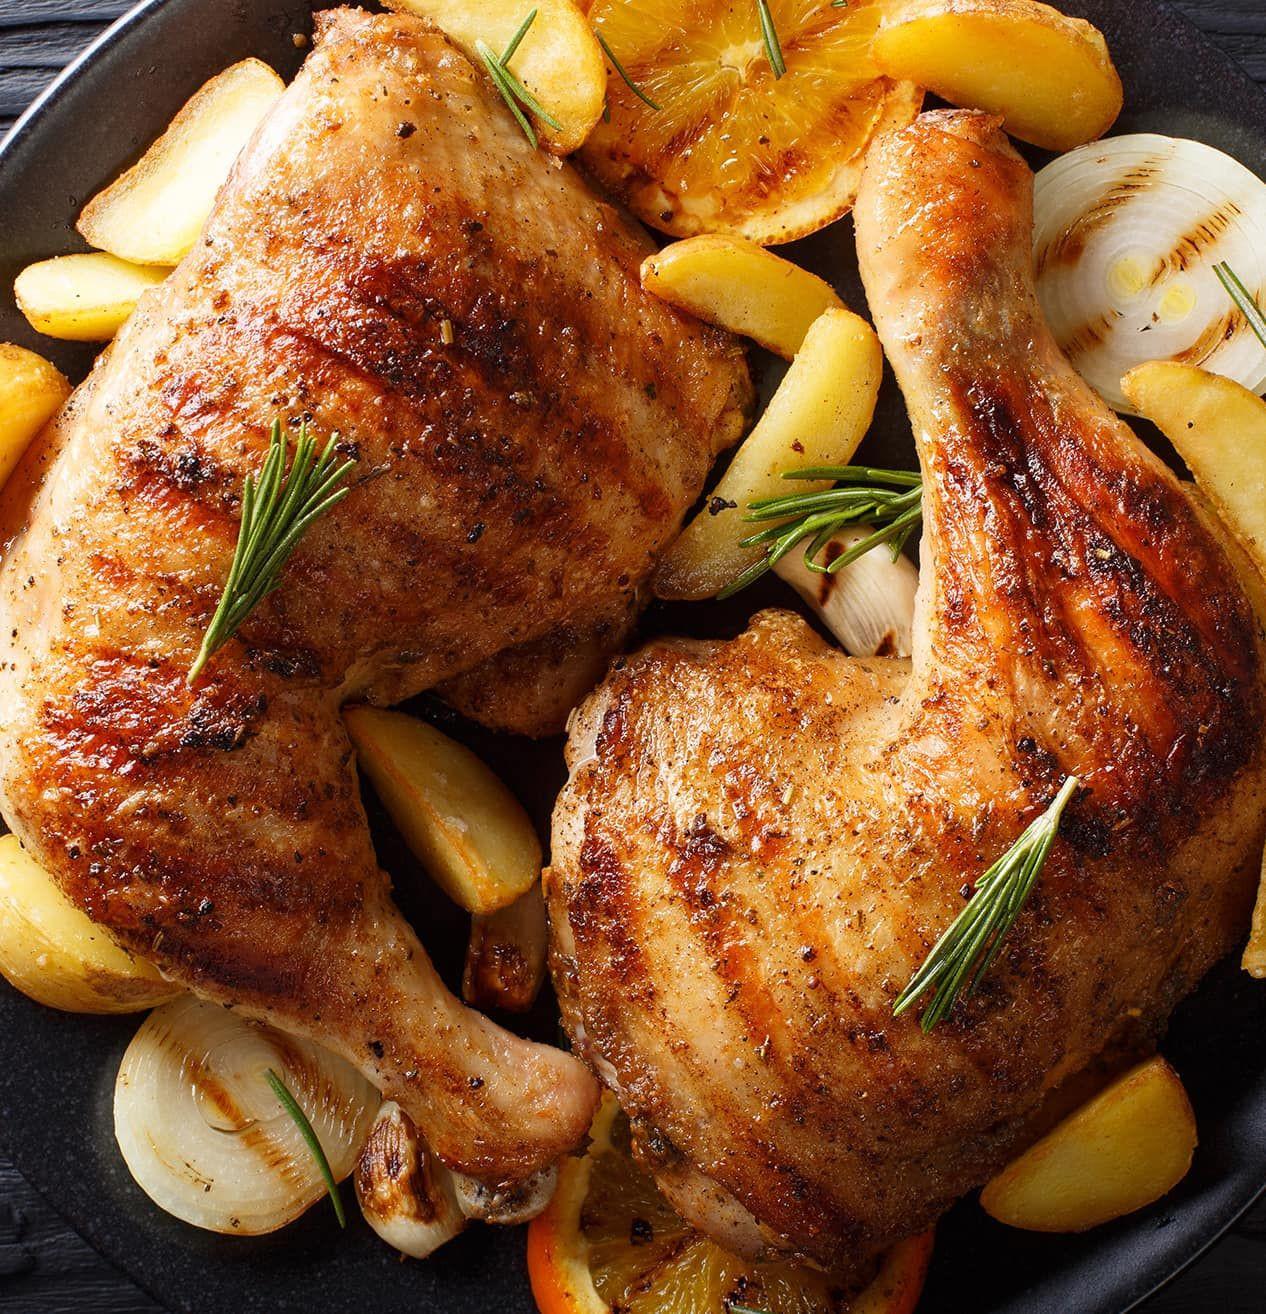 Sheet Pan Boneless Chicken Thighs  Sheet Pan Chicken Thighs with Gold Potatoes Asparagus